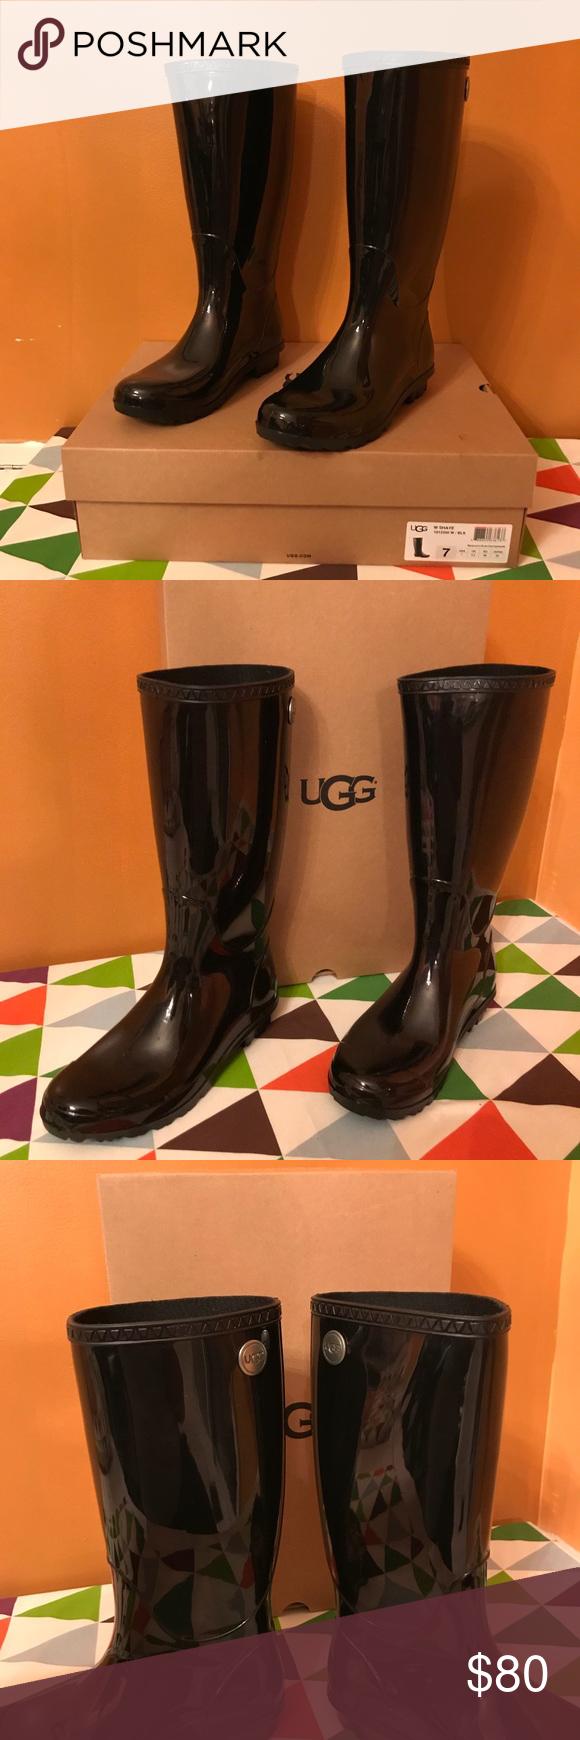 Ugg shaye tall rainboots black size 7 store demo